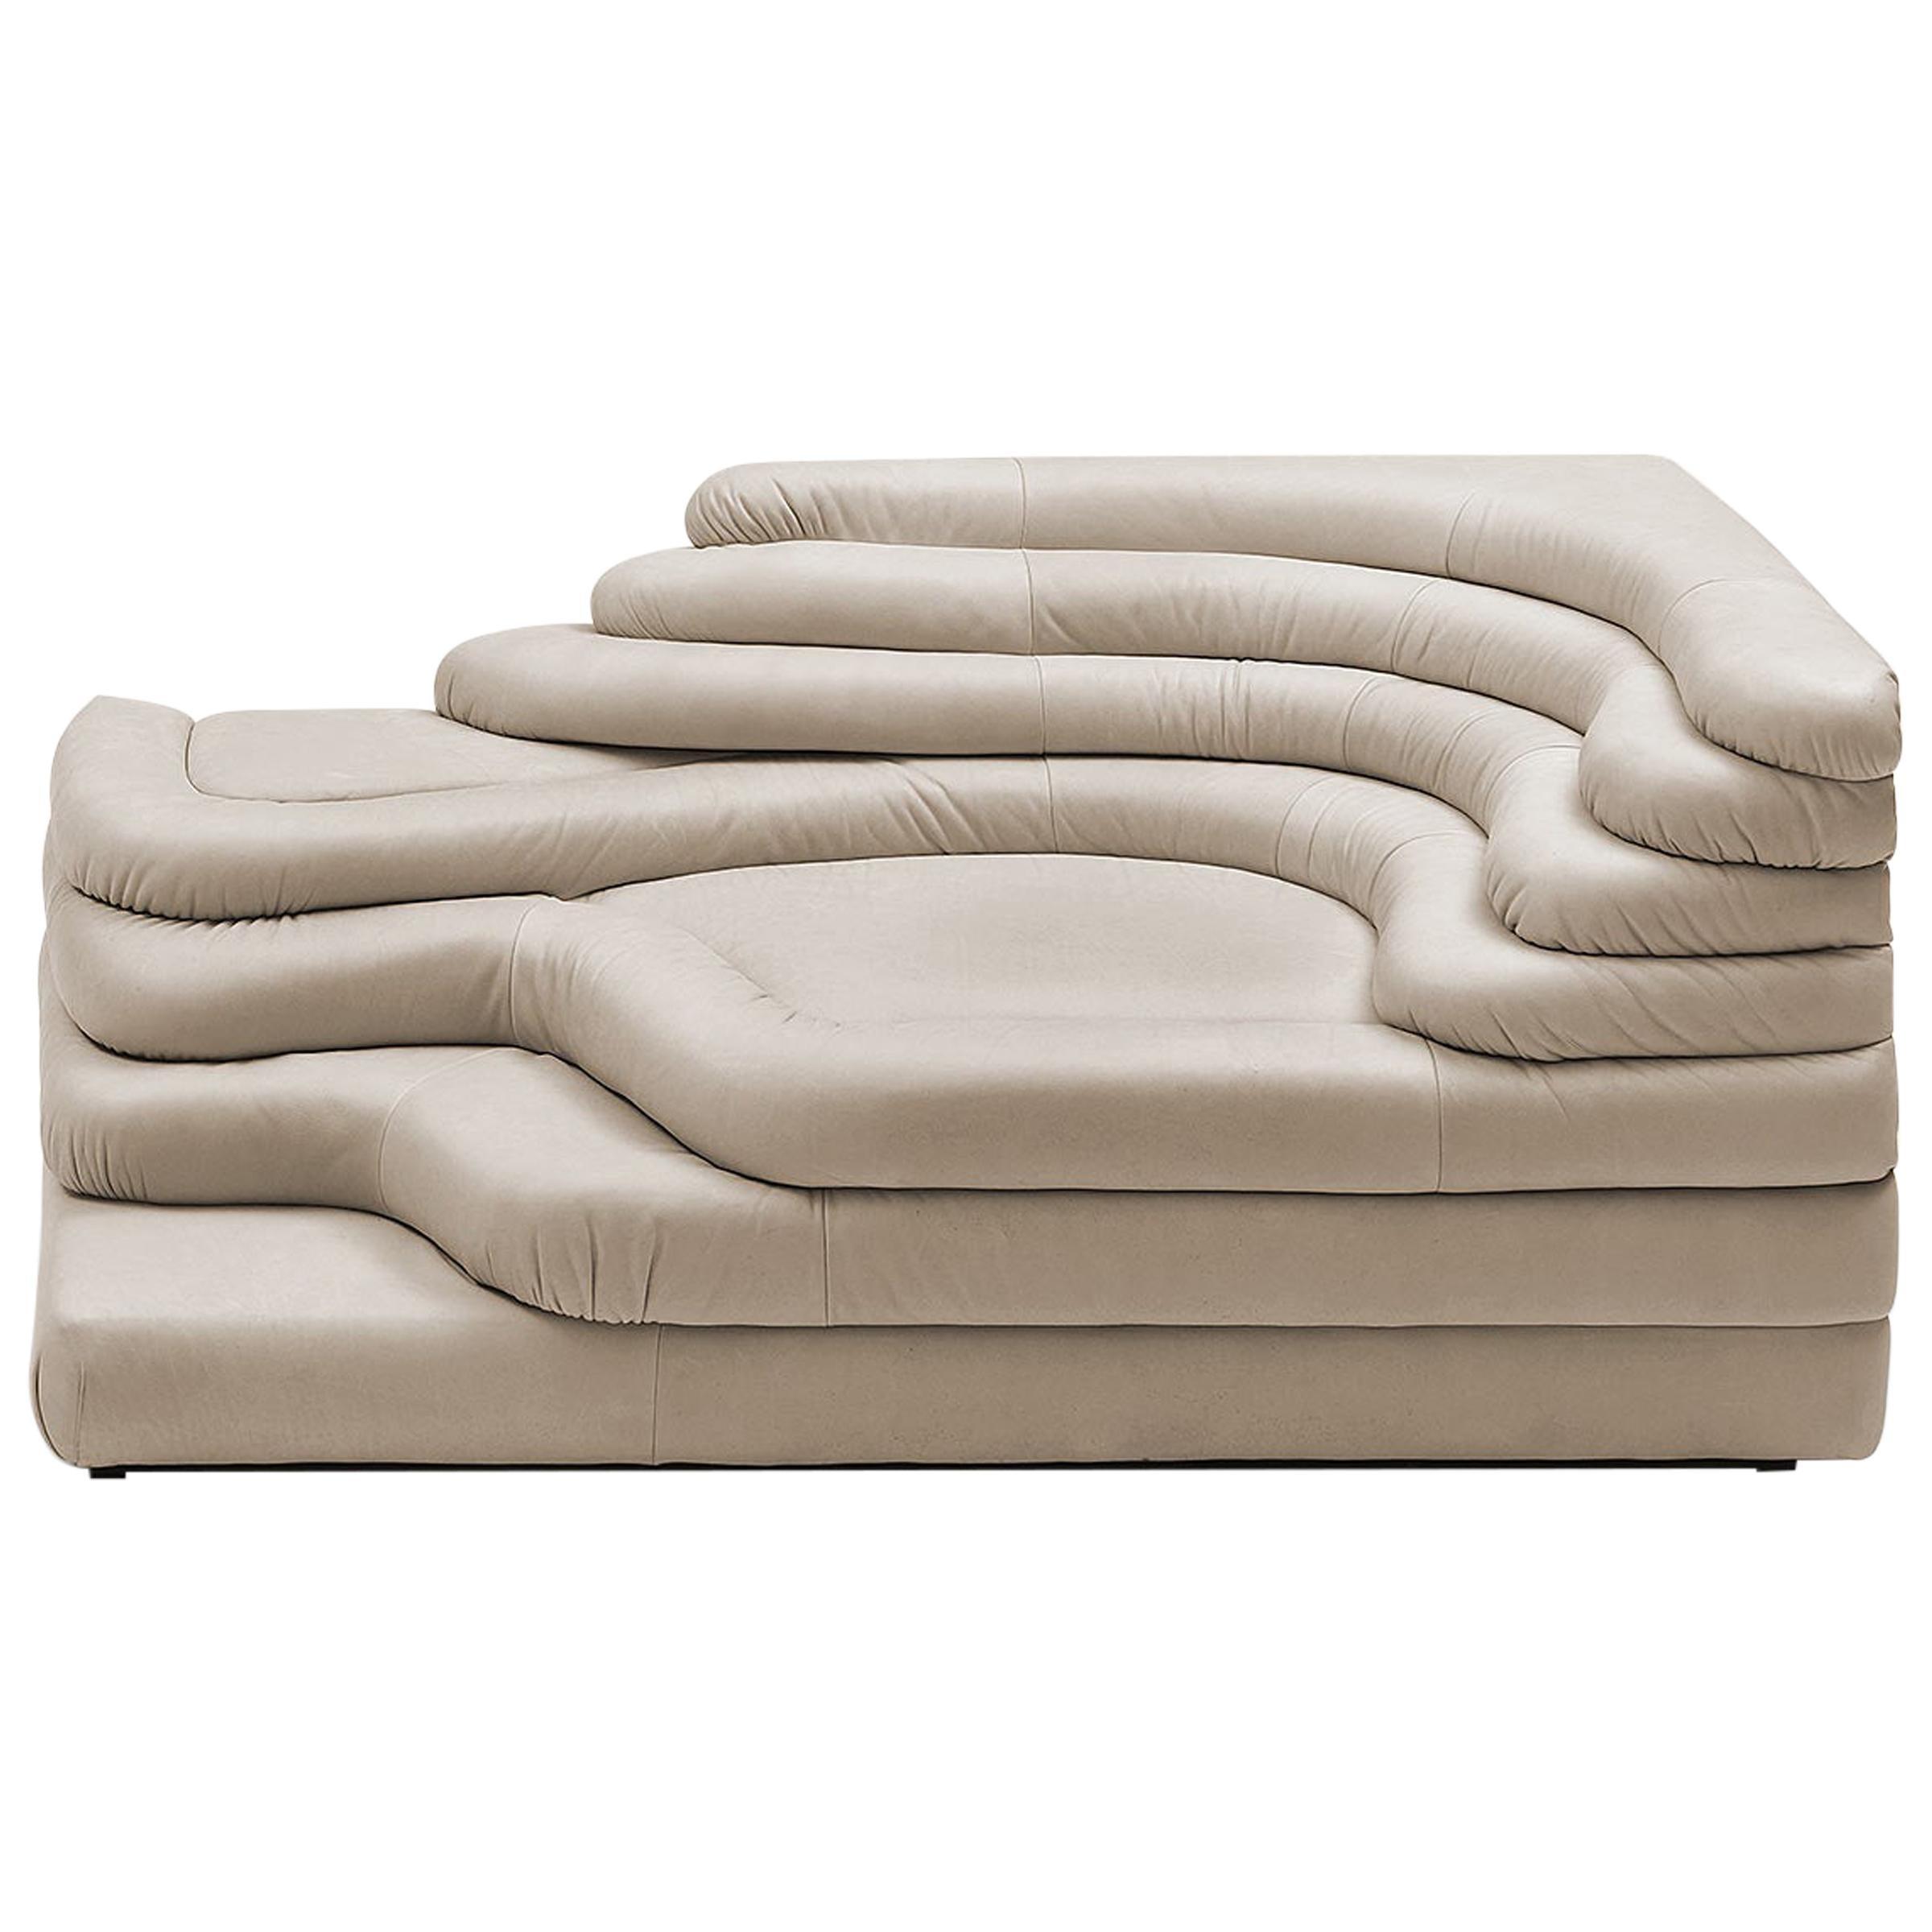 De Sede DS-1025/09 Terraza Sofa in Perla Upholstery by Ubald Klug, 1 Element